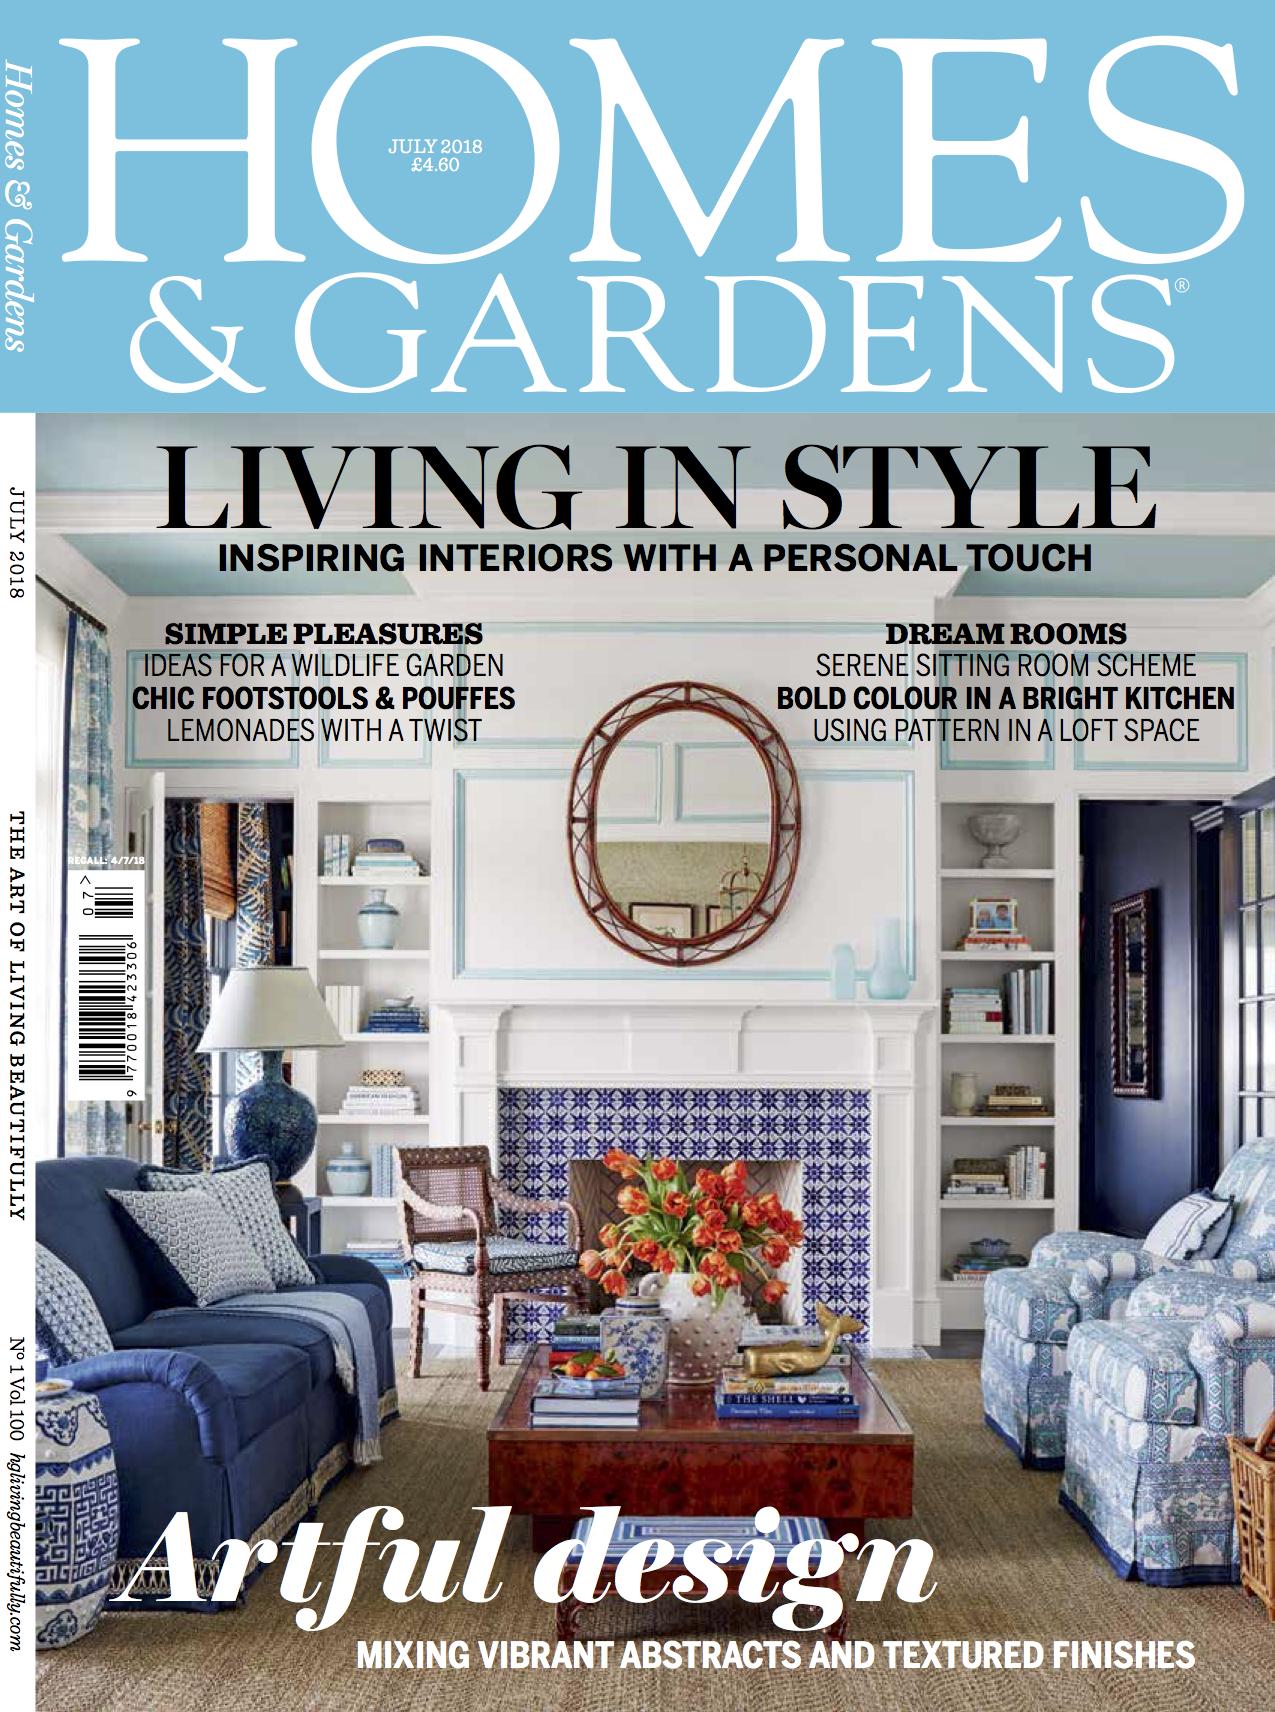 Homes & Gardens - July 2018